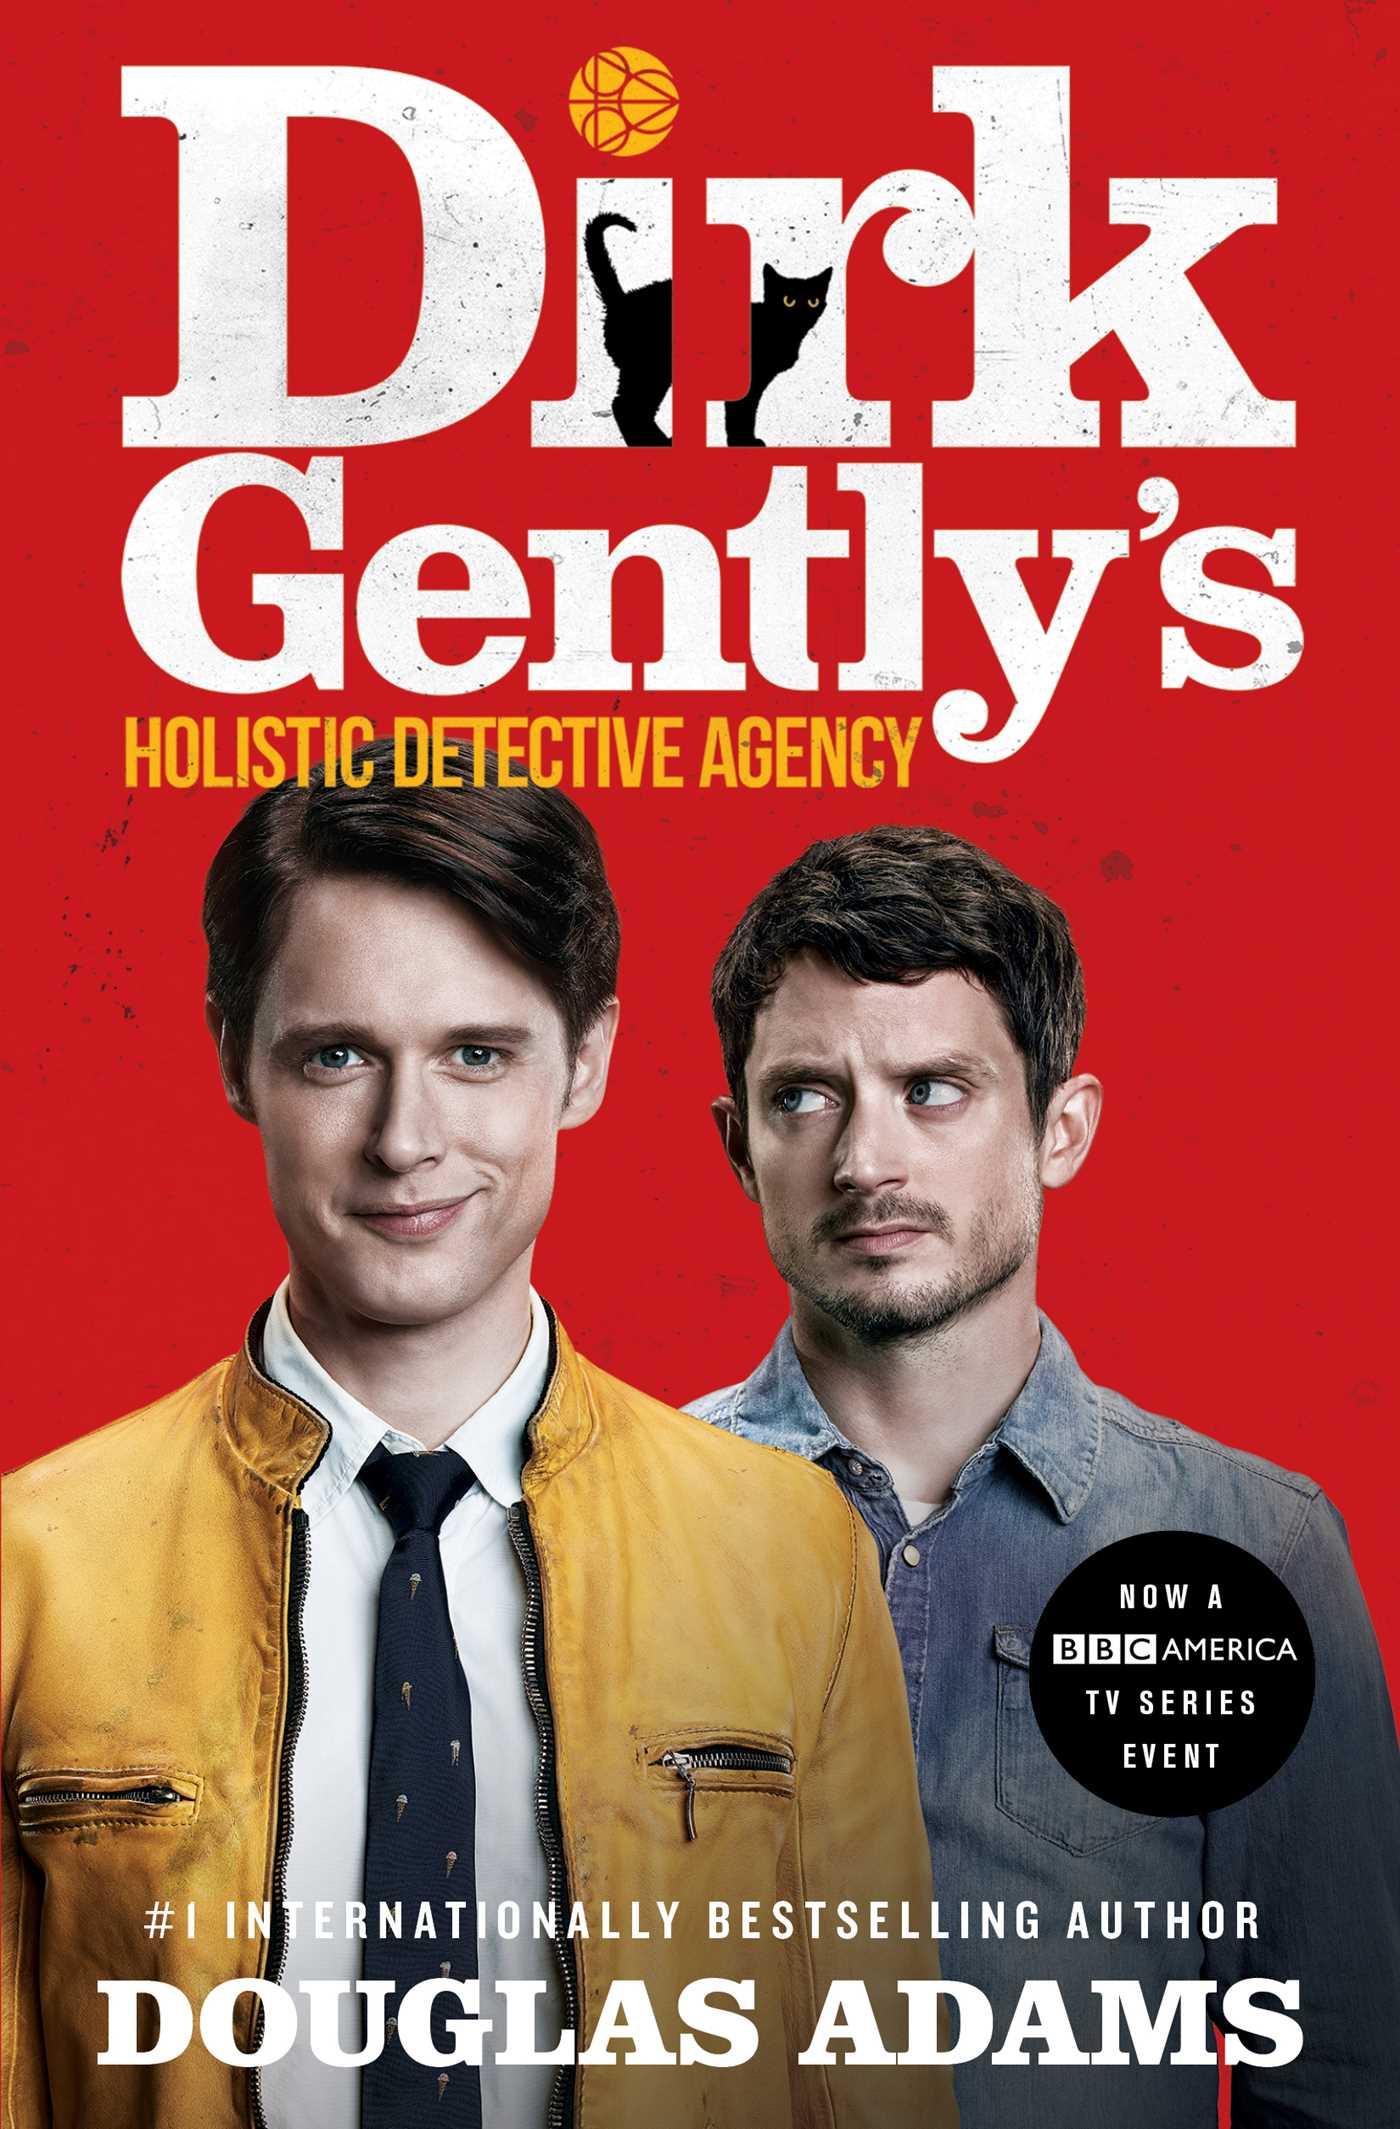 Dirk gentlys holistic detective agency 9781439140611 hr